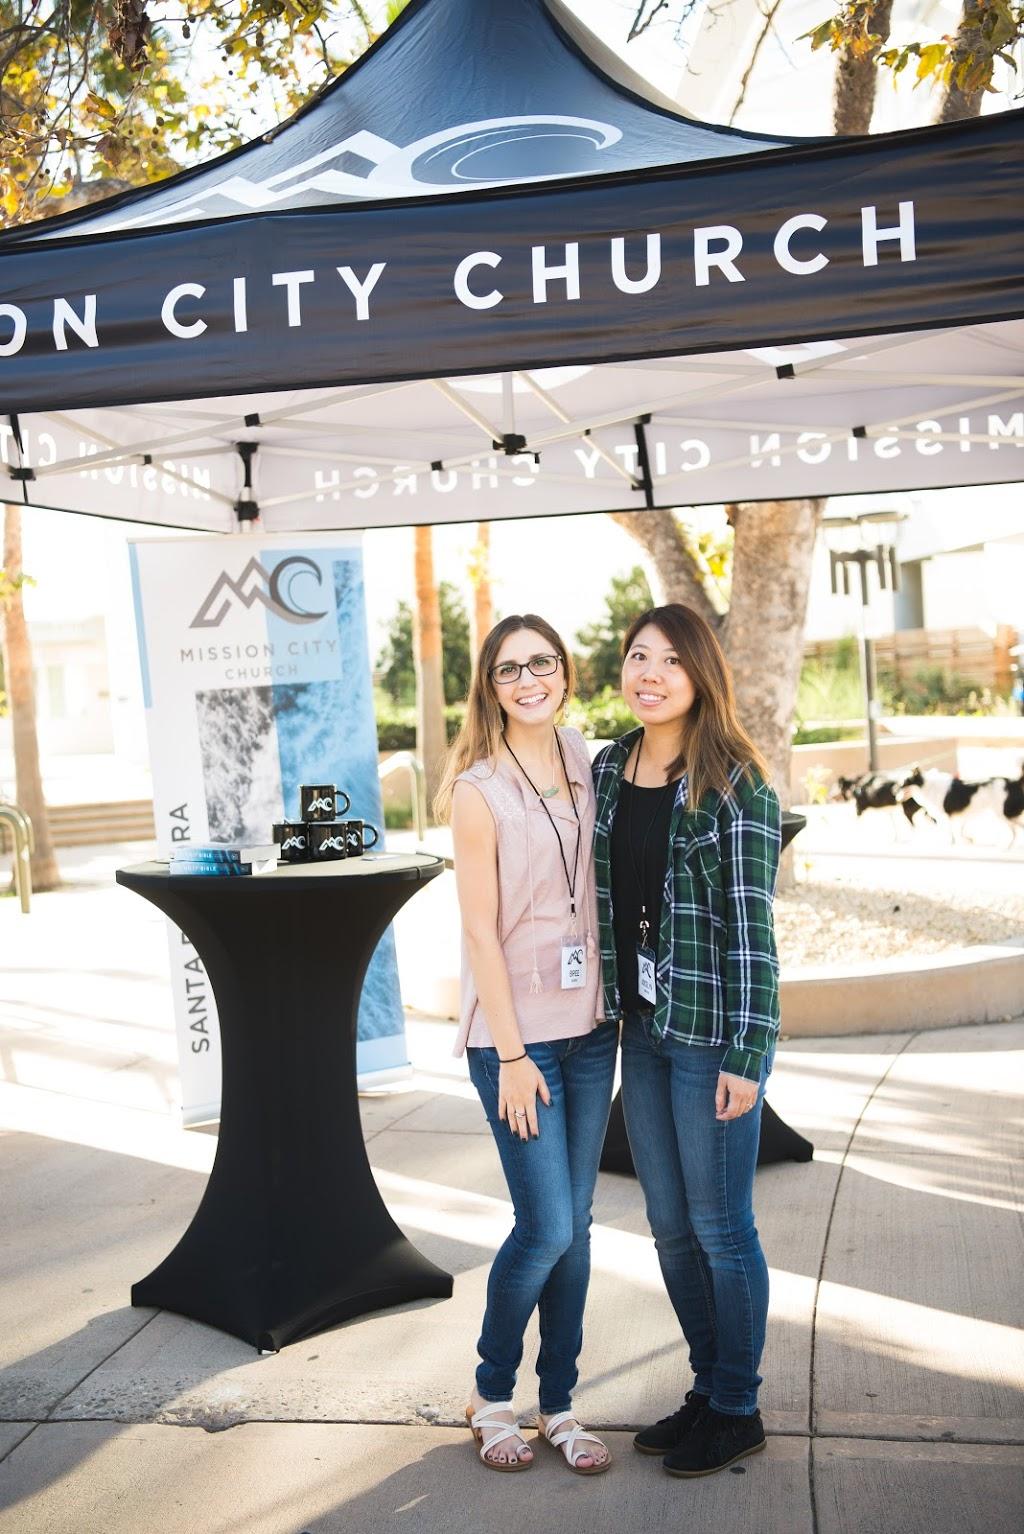 Mission City Church - church  | Photo 9 of 10 | Address: 965 Cliff Dr, Santa Barbara, CA 93109, USA | Phone: (805) 946-0598